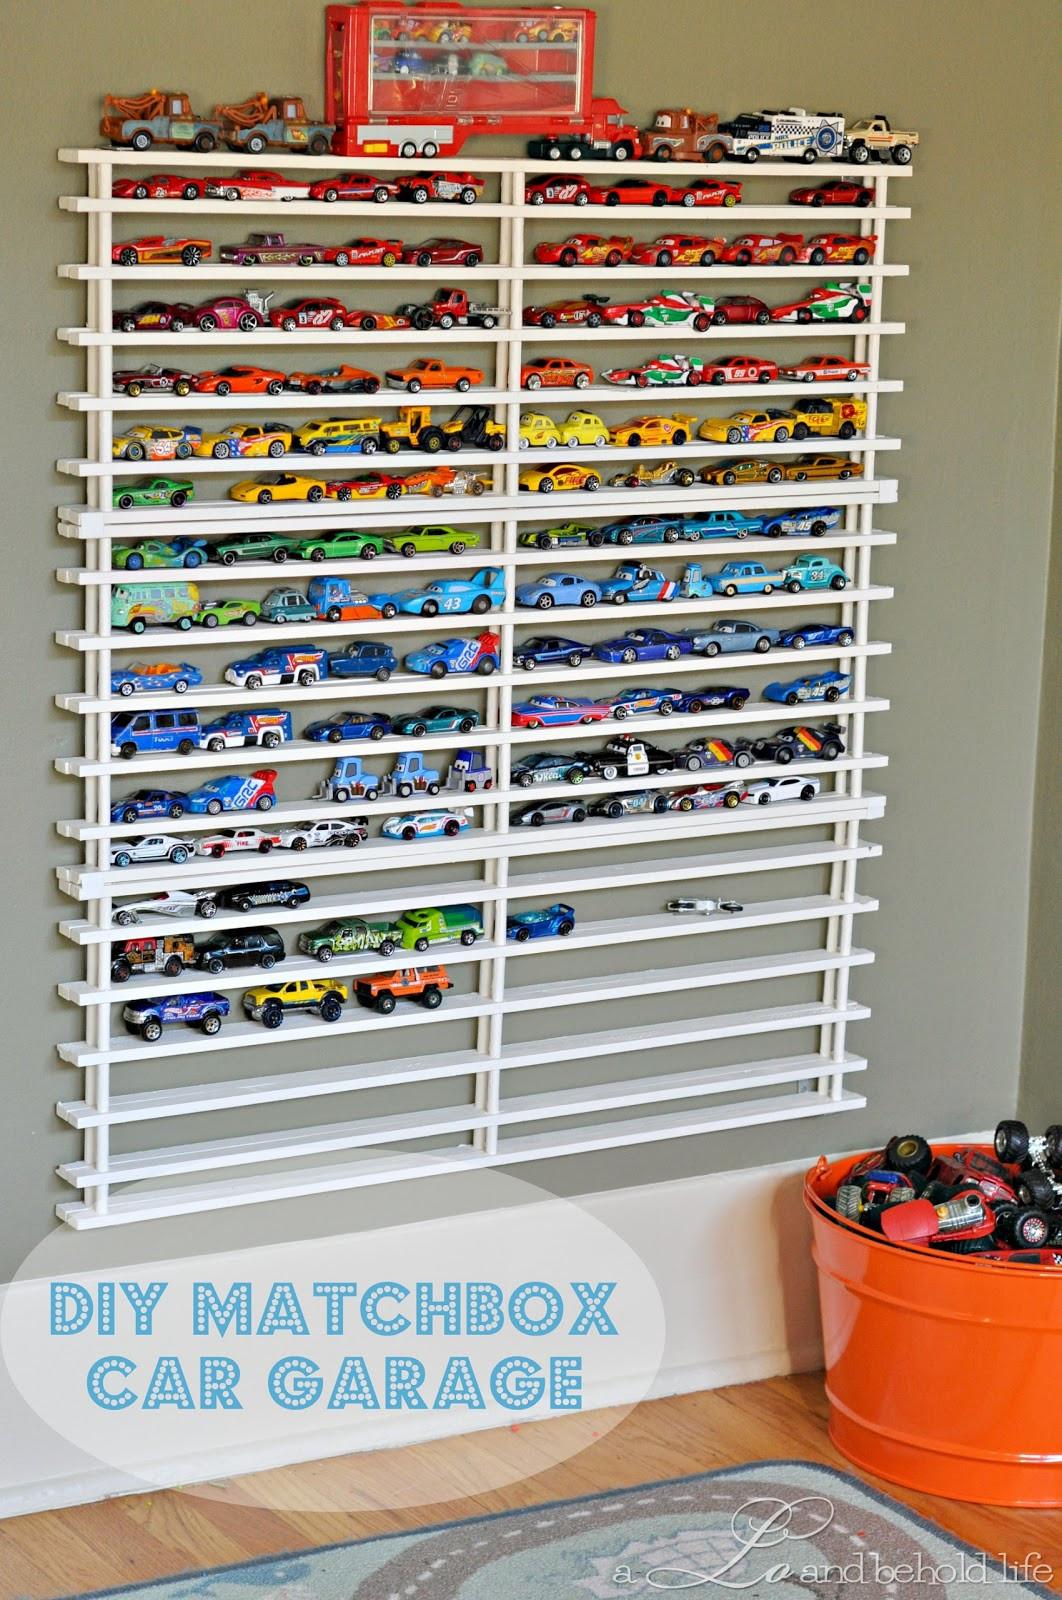 Best ideas about DIY Automotive Garage . Save or Pin DIY Matchbox Car Garage UPDATED Now.